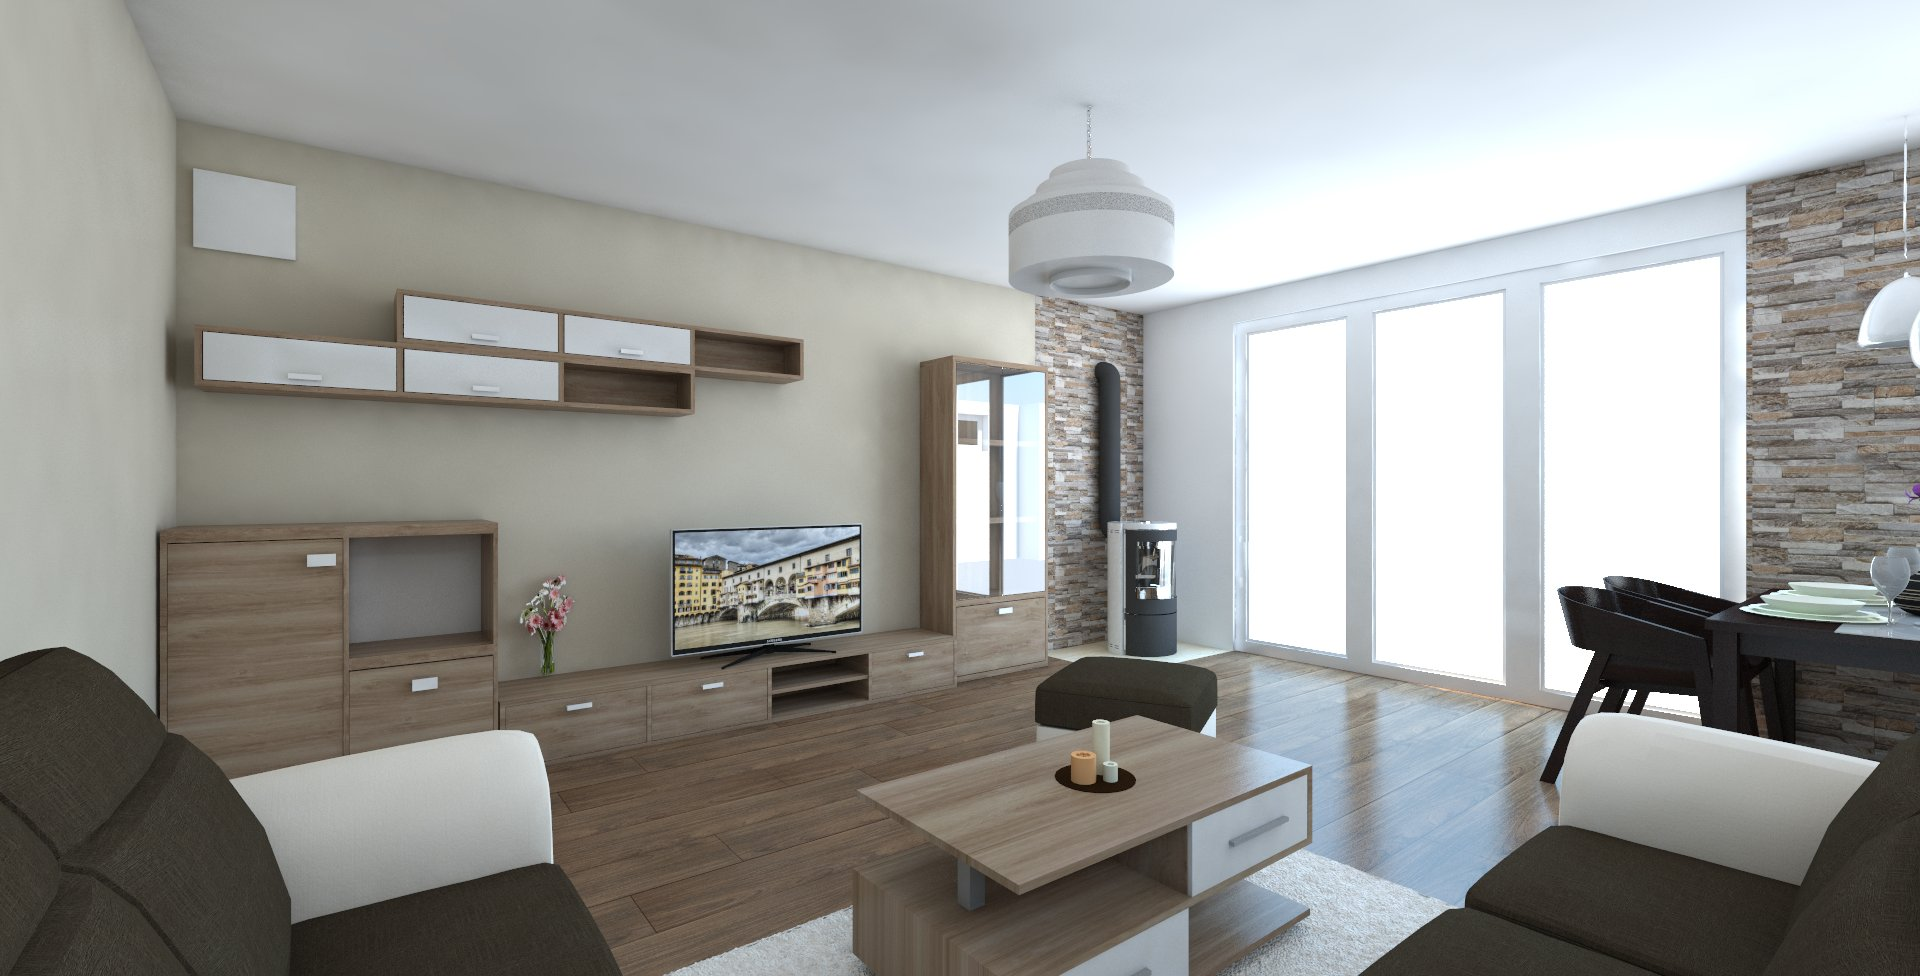 Návrh interiéru domu – Horné Vestenice